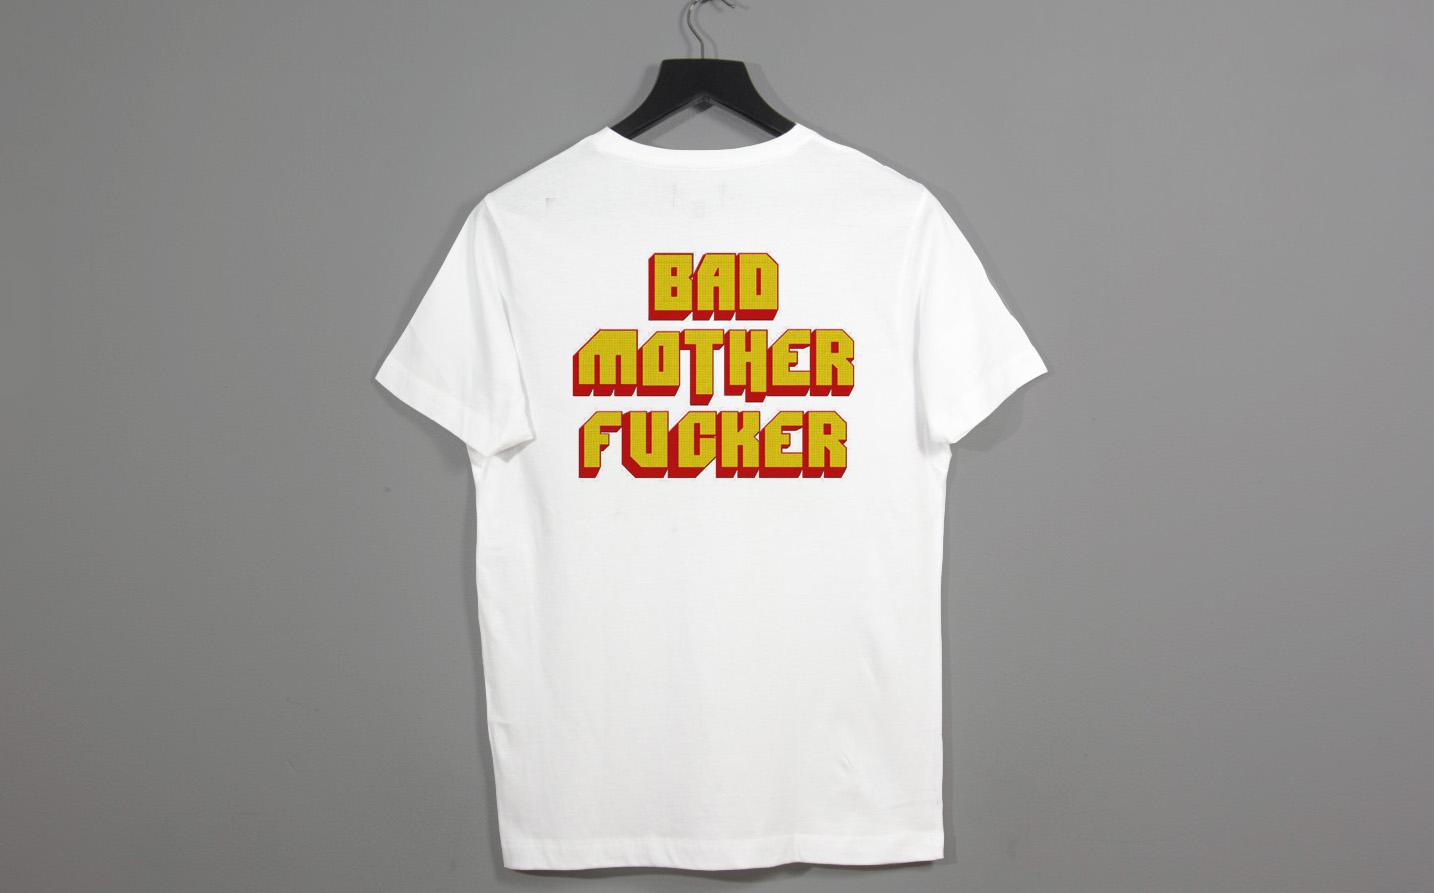 T-shirt - Bad motherfu*ker